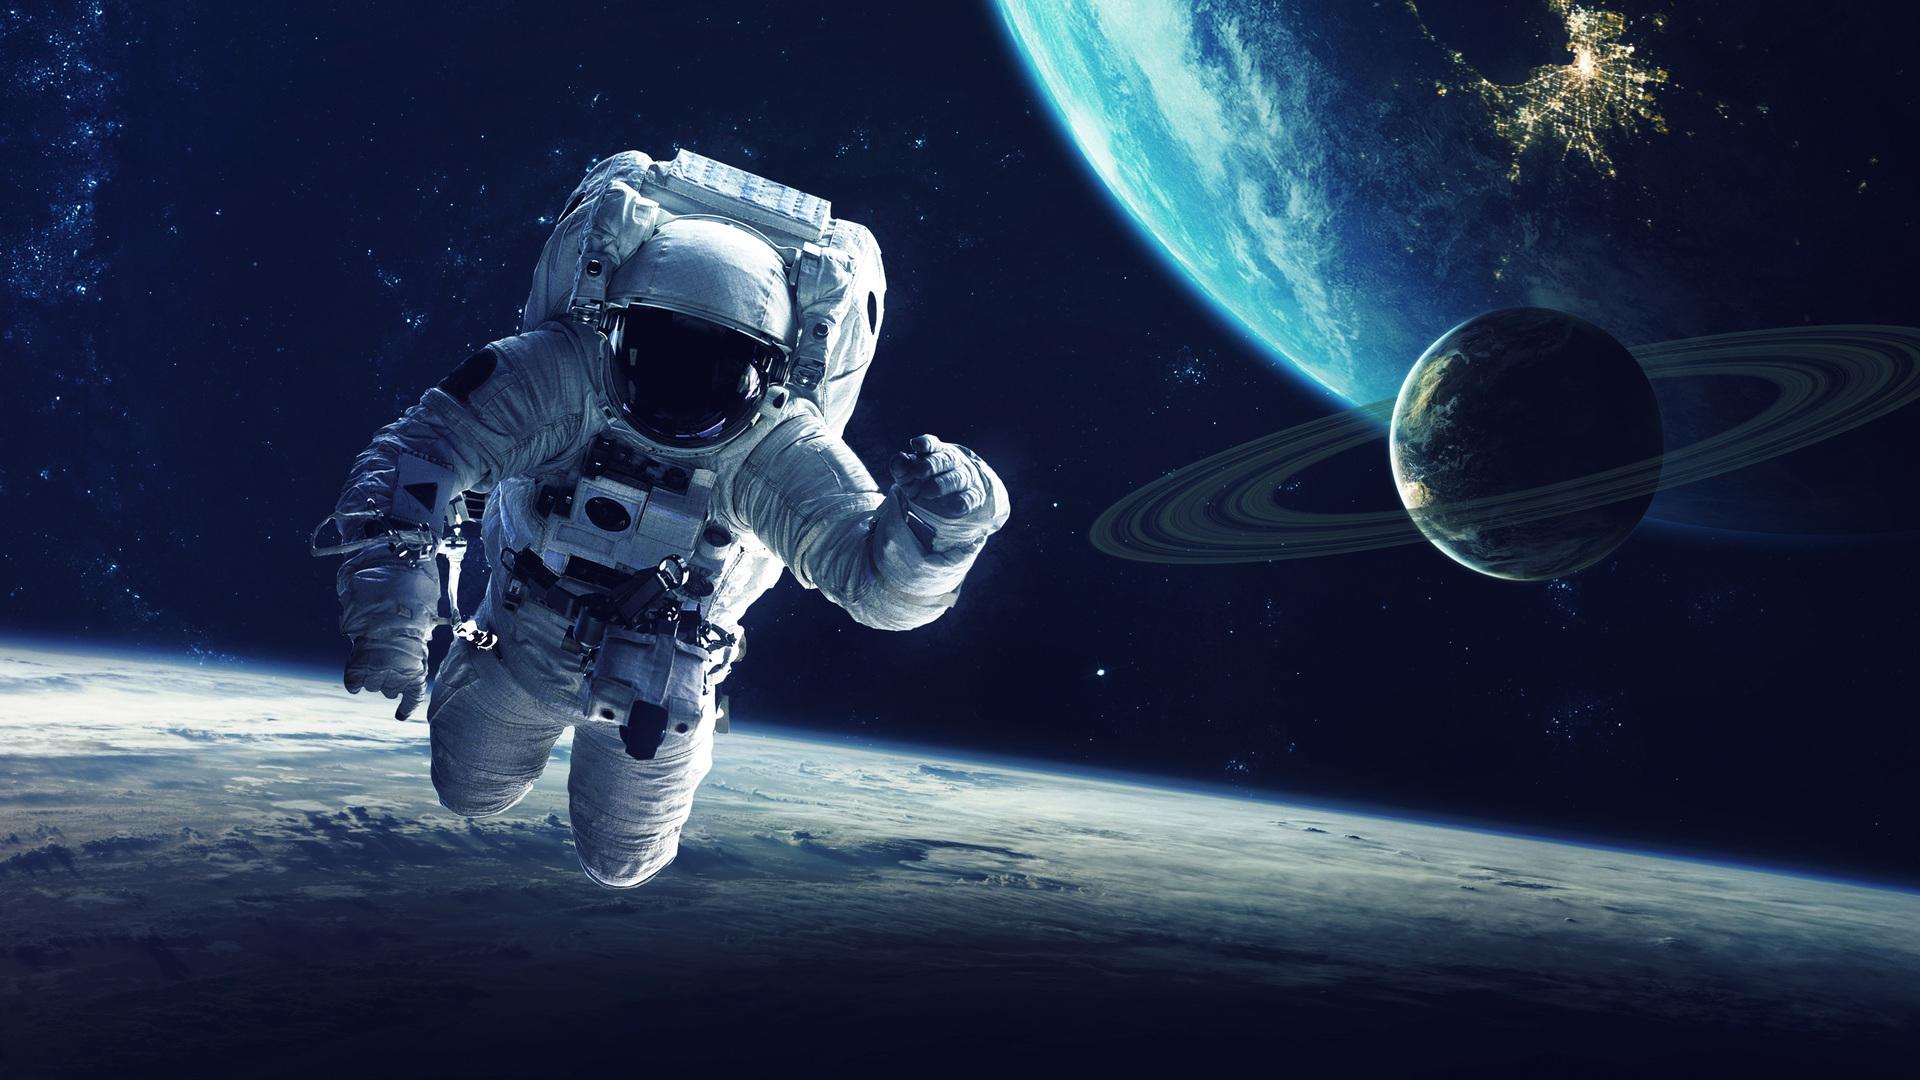 1920x1080 astronaut 5k laptop full hd 1080p hd 4k - 4k resolution space wallpaper ...